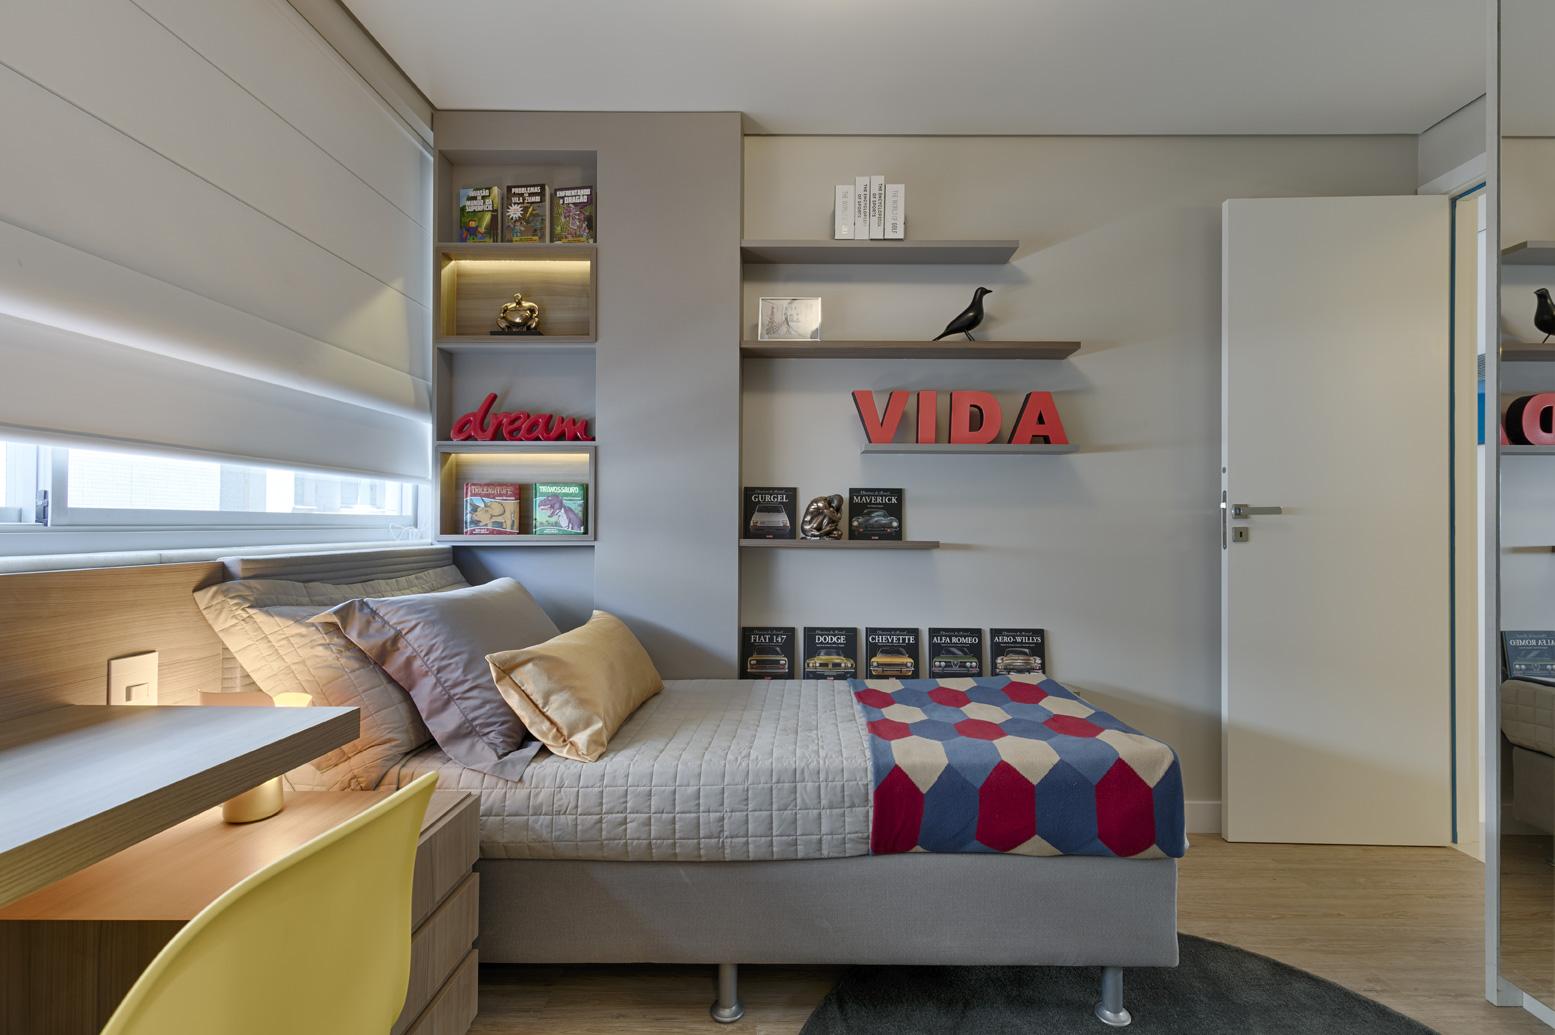 Marcia-Carvalhaes-Empreendimentos-imobiliarios-apartamento-decorado-living-savassi-monterre-001